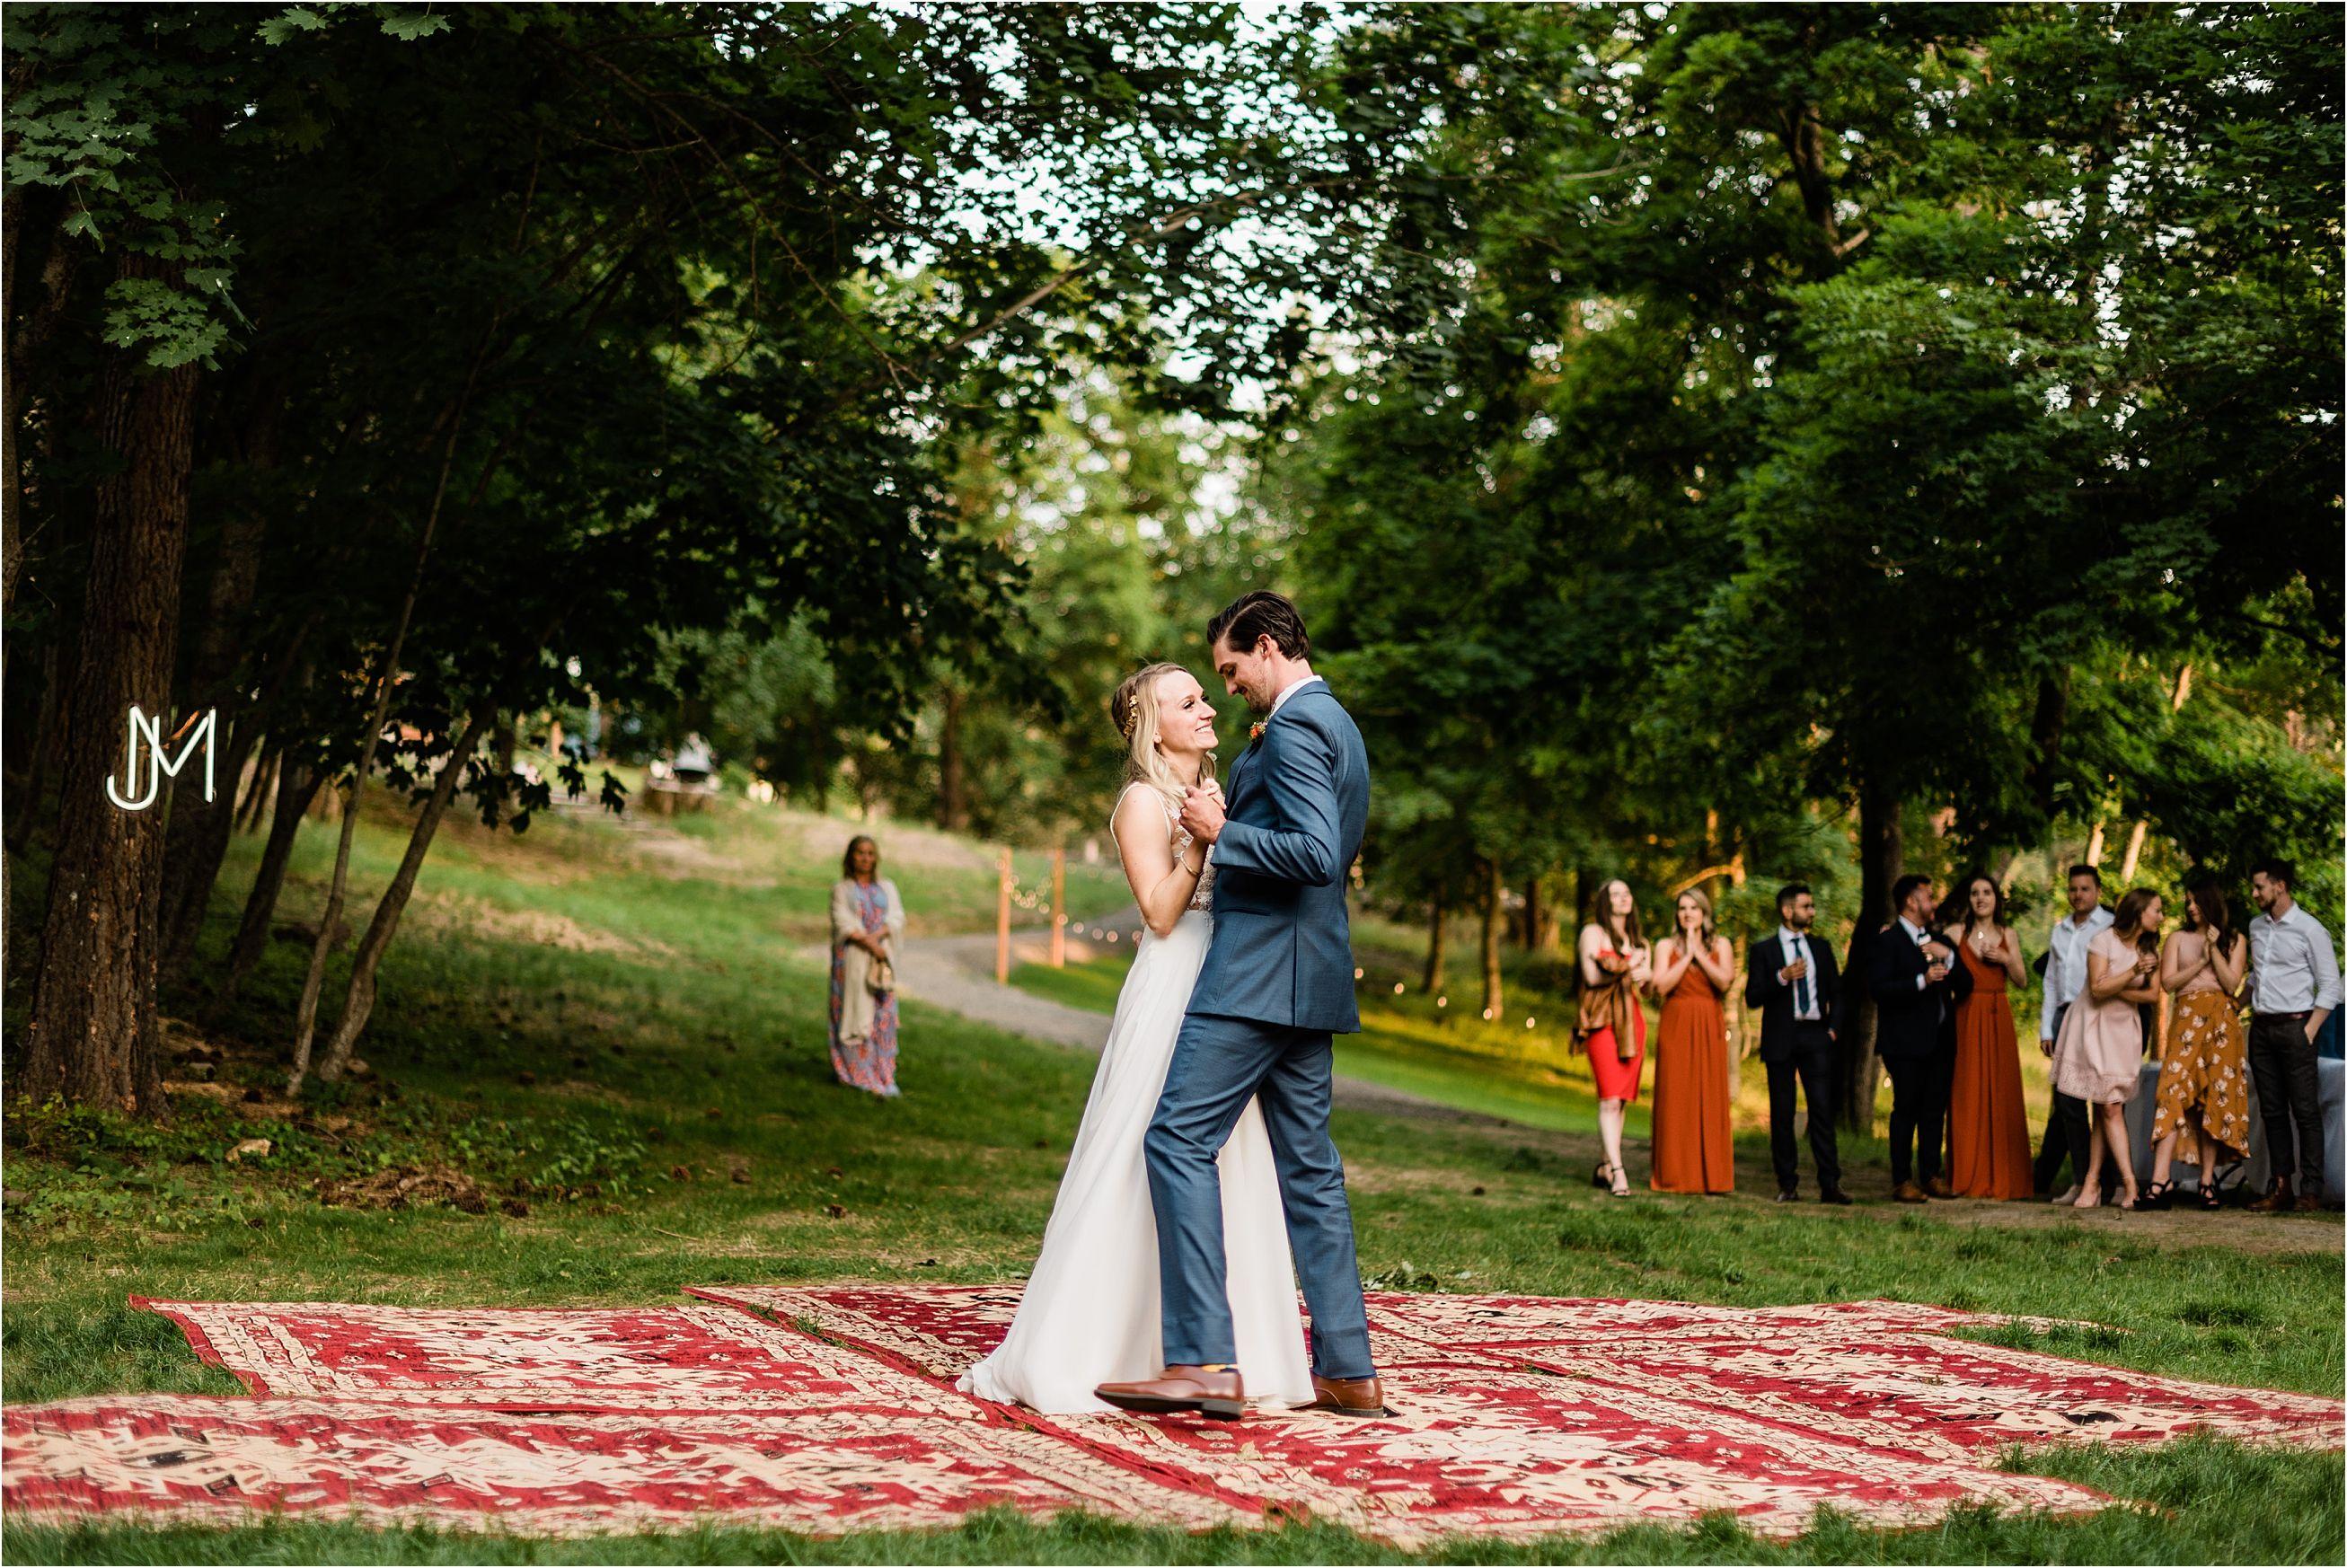 Woodsy Bright Minimalist Wedding At Zephyr Lodge Liberty Lake Spokane Weddings Lodge Wedding Minimalist Wedding